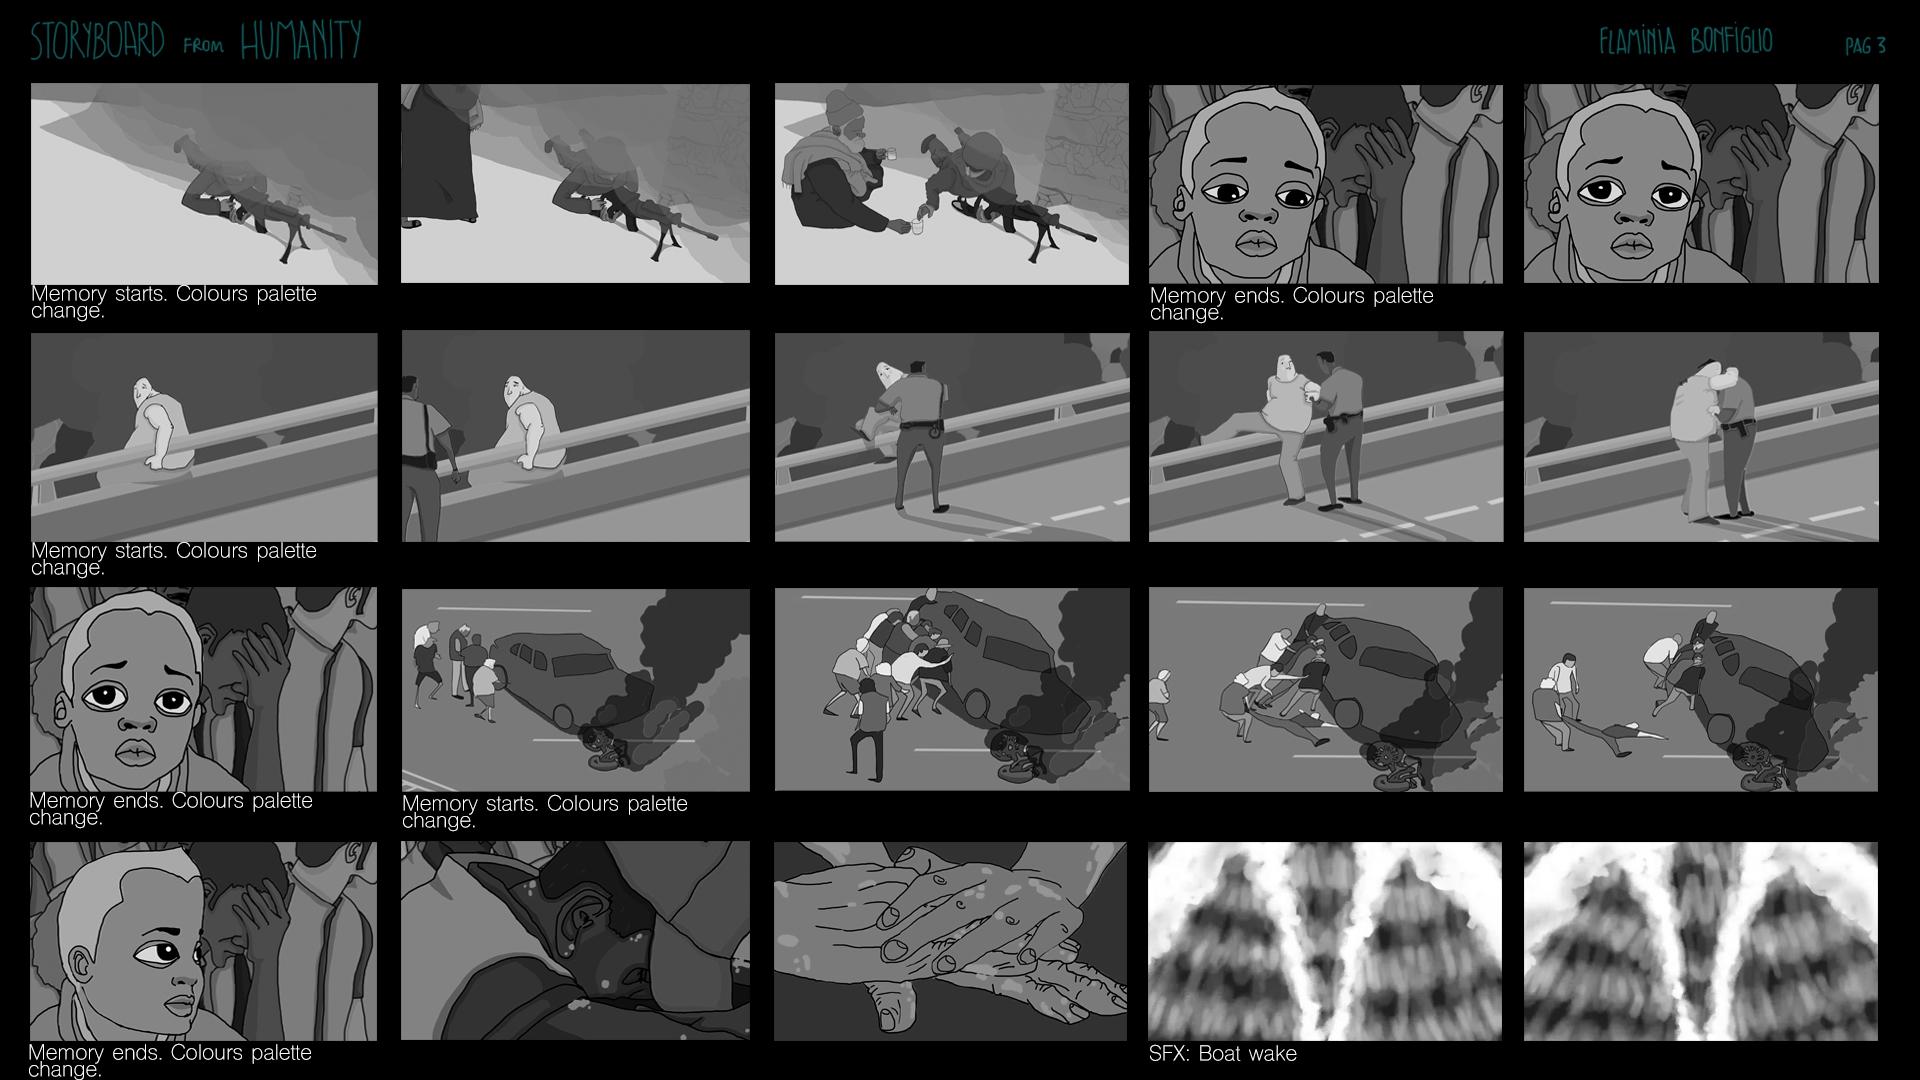 storyboard digital humanity_b&w_corrected_3.jpg